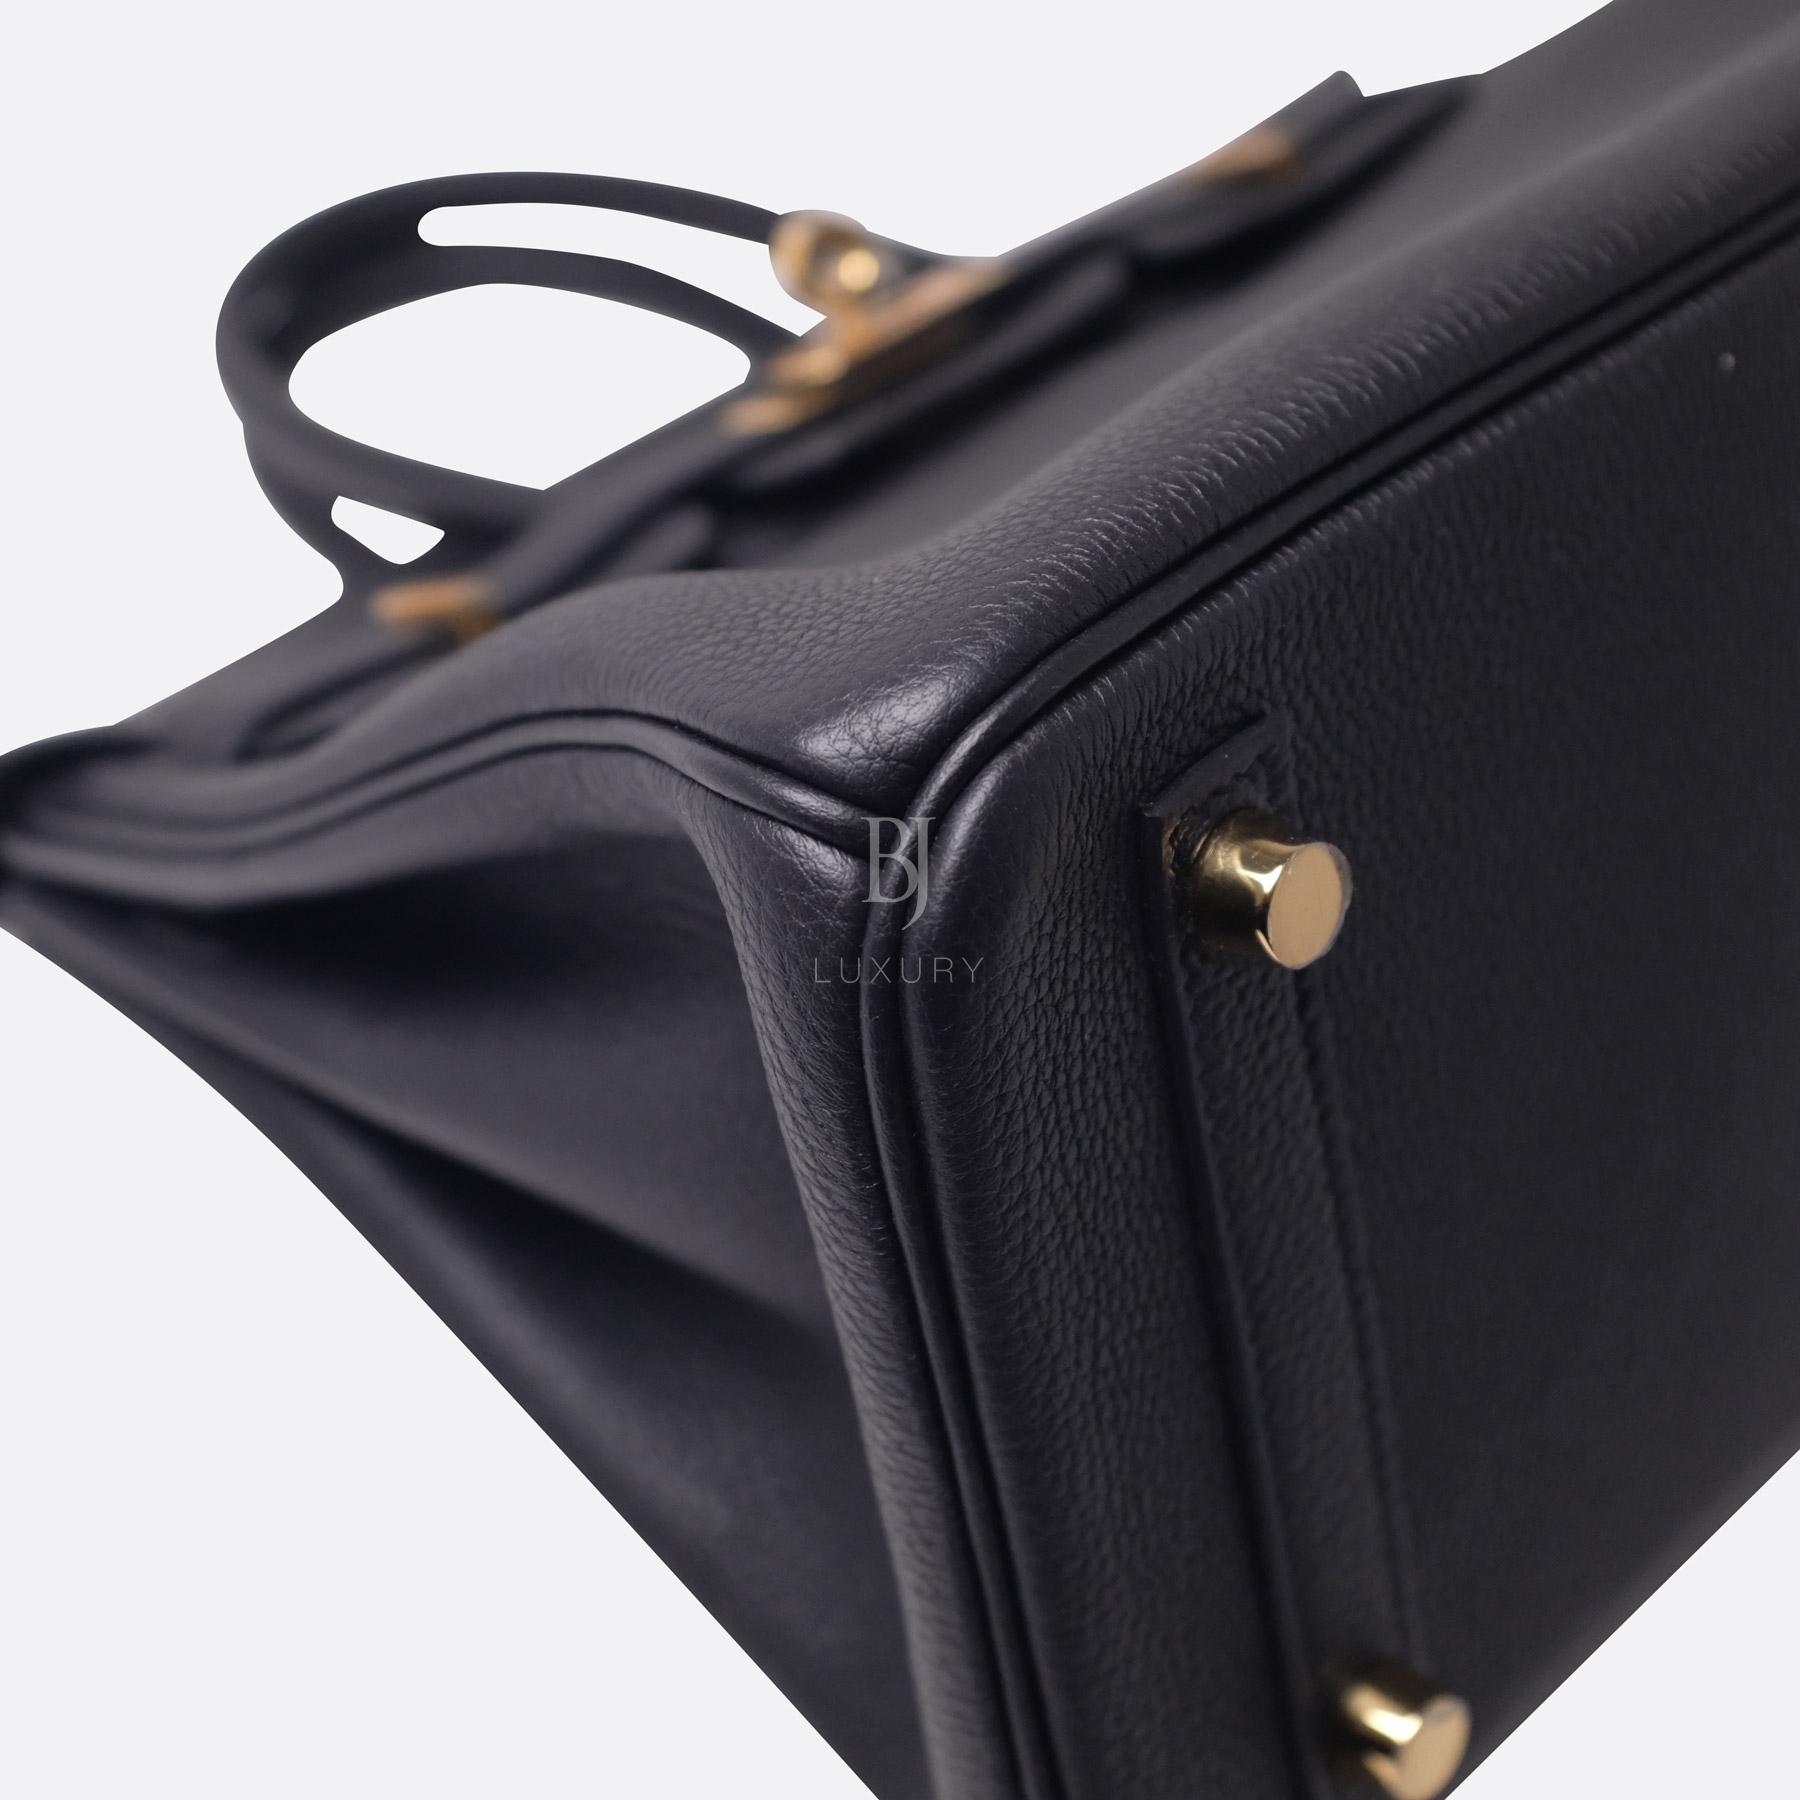 Hermes Birkin 25 Black Togo Gold Hardware BJ Luxury 16.jpg